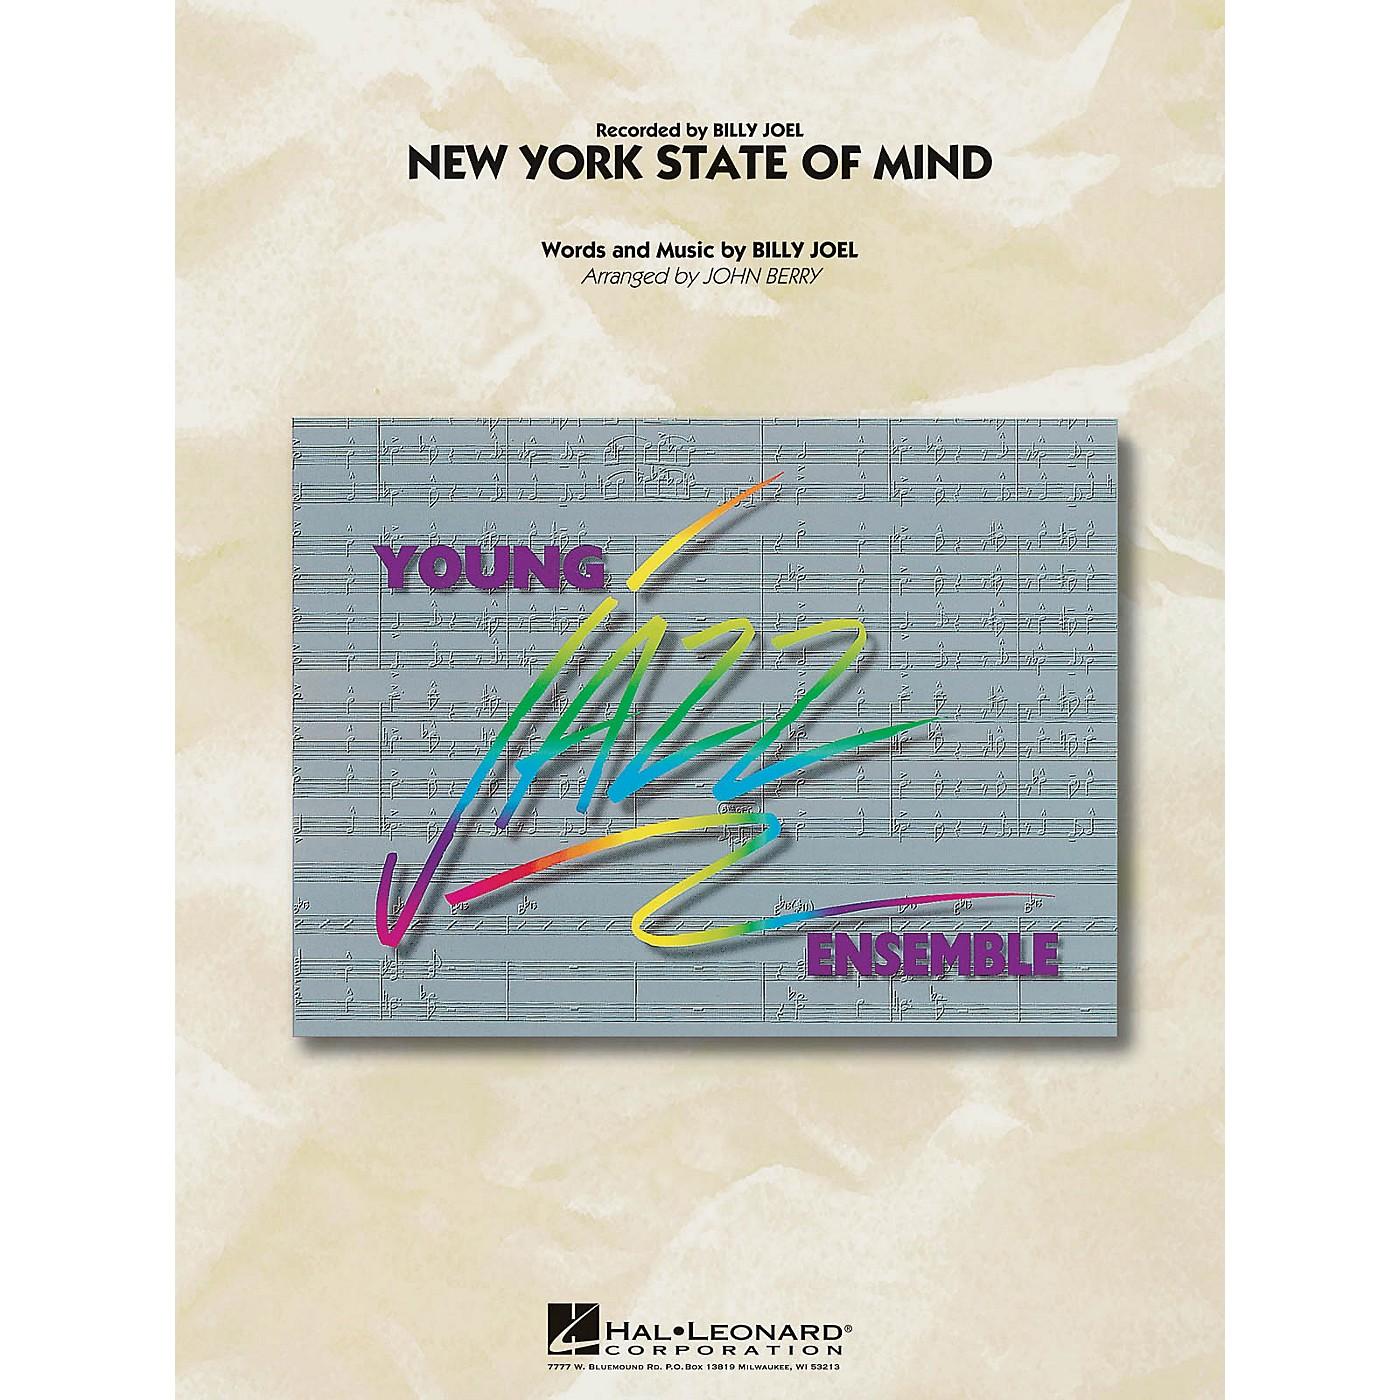 Hal Leonard New York State of Mind Jazz Band Level 3 Arranged by John Berry thumbnail